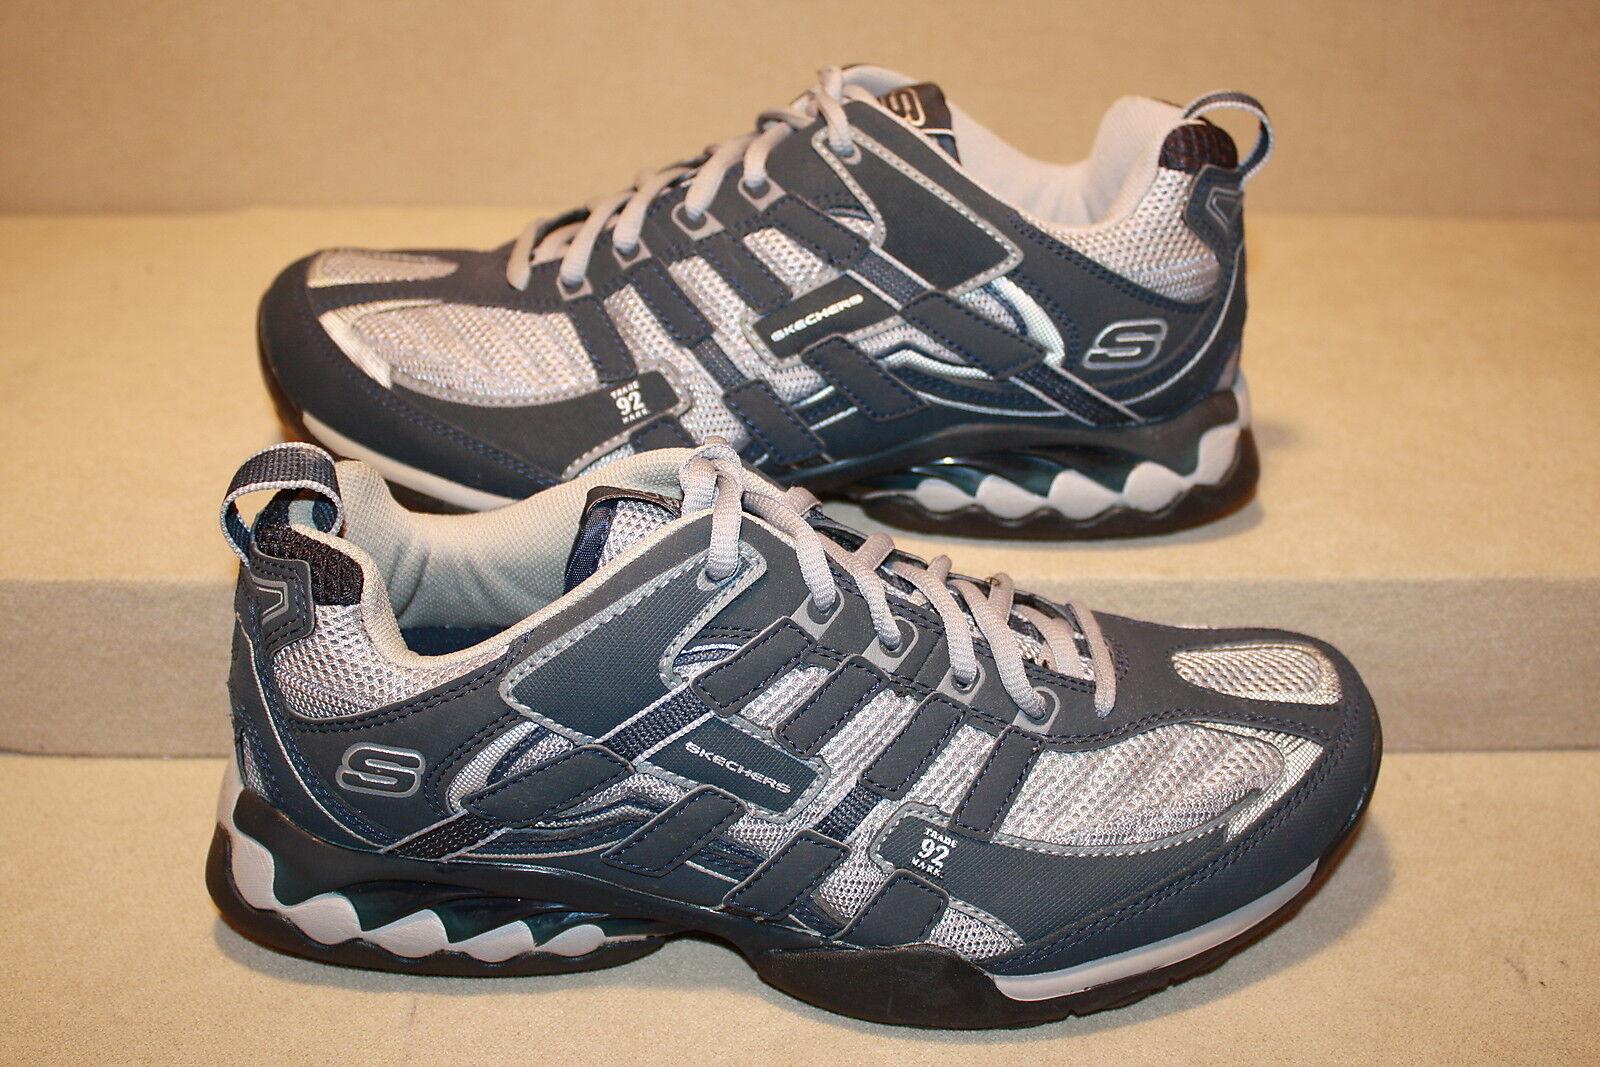 Uomo skechers grigio / blu scarpe vedi - vedi scarpe elenco per dimensioni (951) 098c55